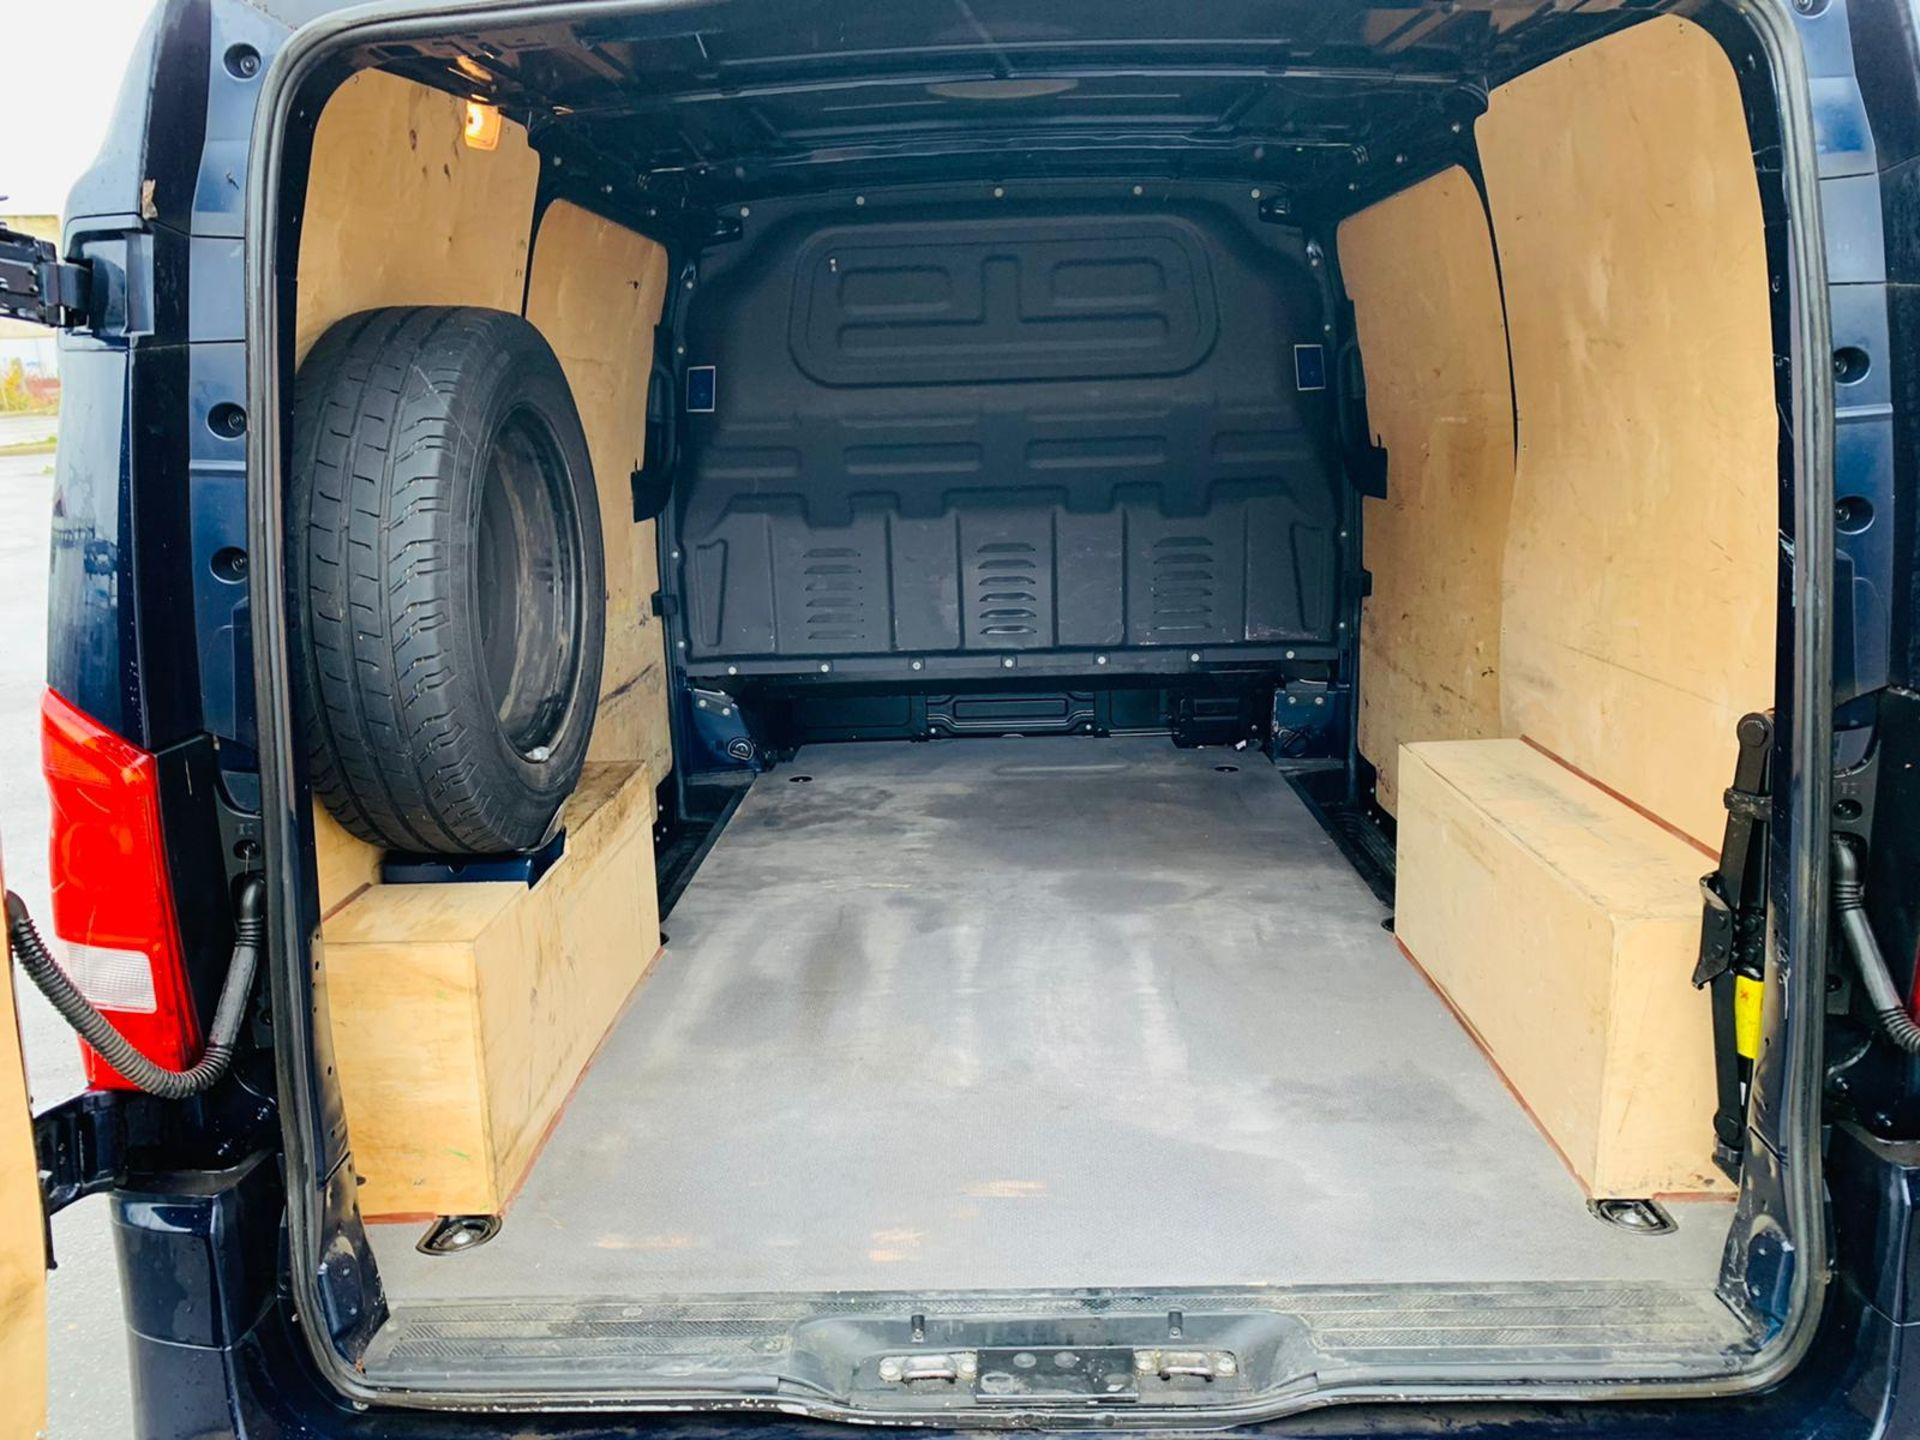 (RESERVE MET) Mercedes Vito 116Cdi Sporty Spec (161 BHP) Bluetech 6 Speed Van - 2016 Model - AC - Image 12 of 28